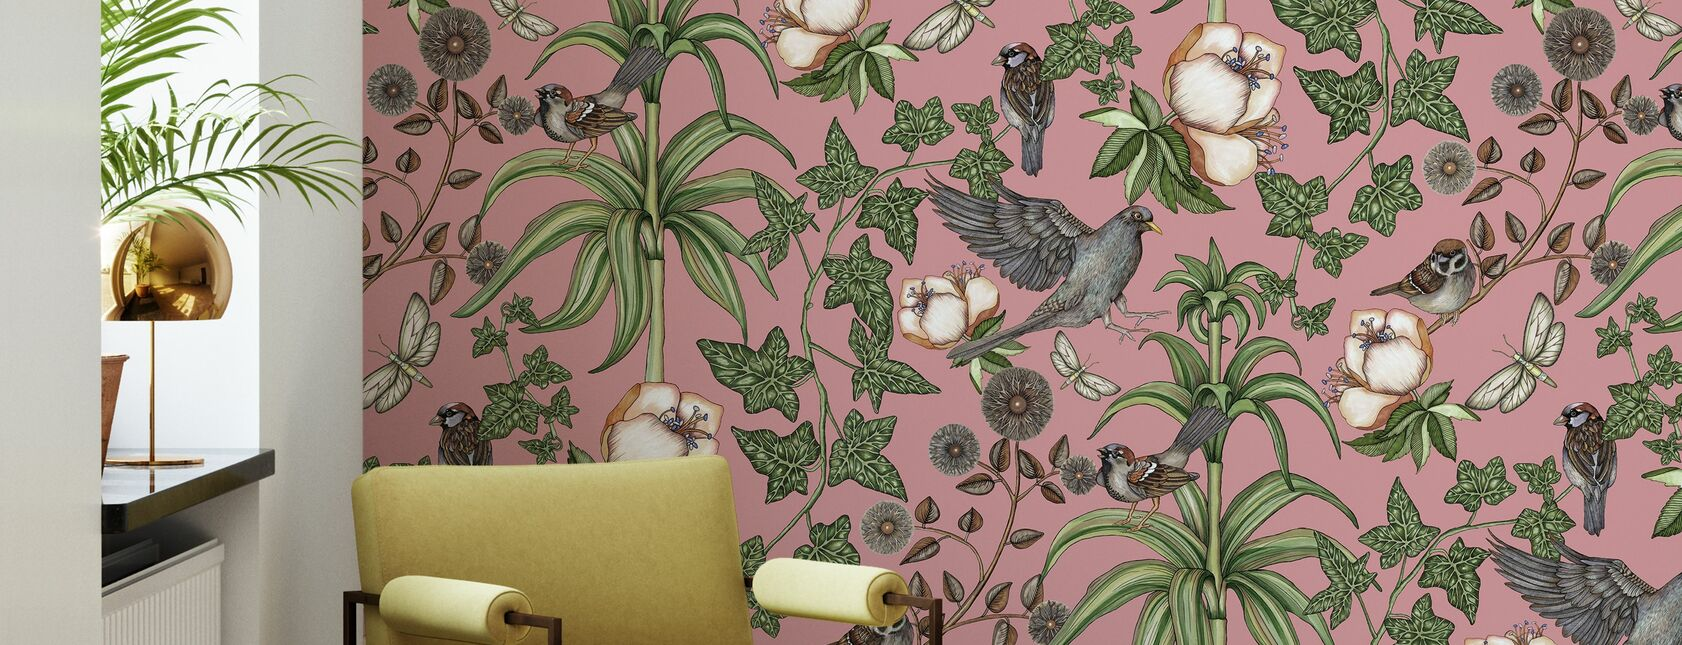 Ivy Rose - Wallpaper - Living Room